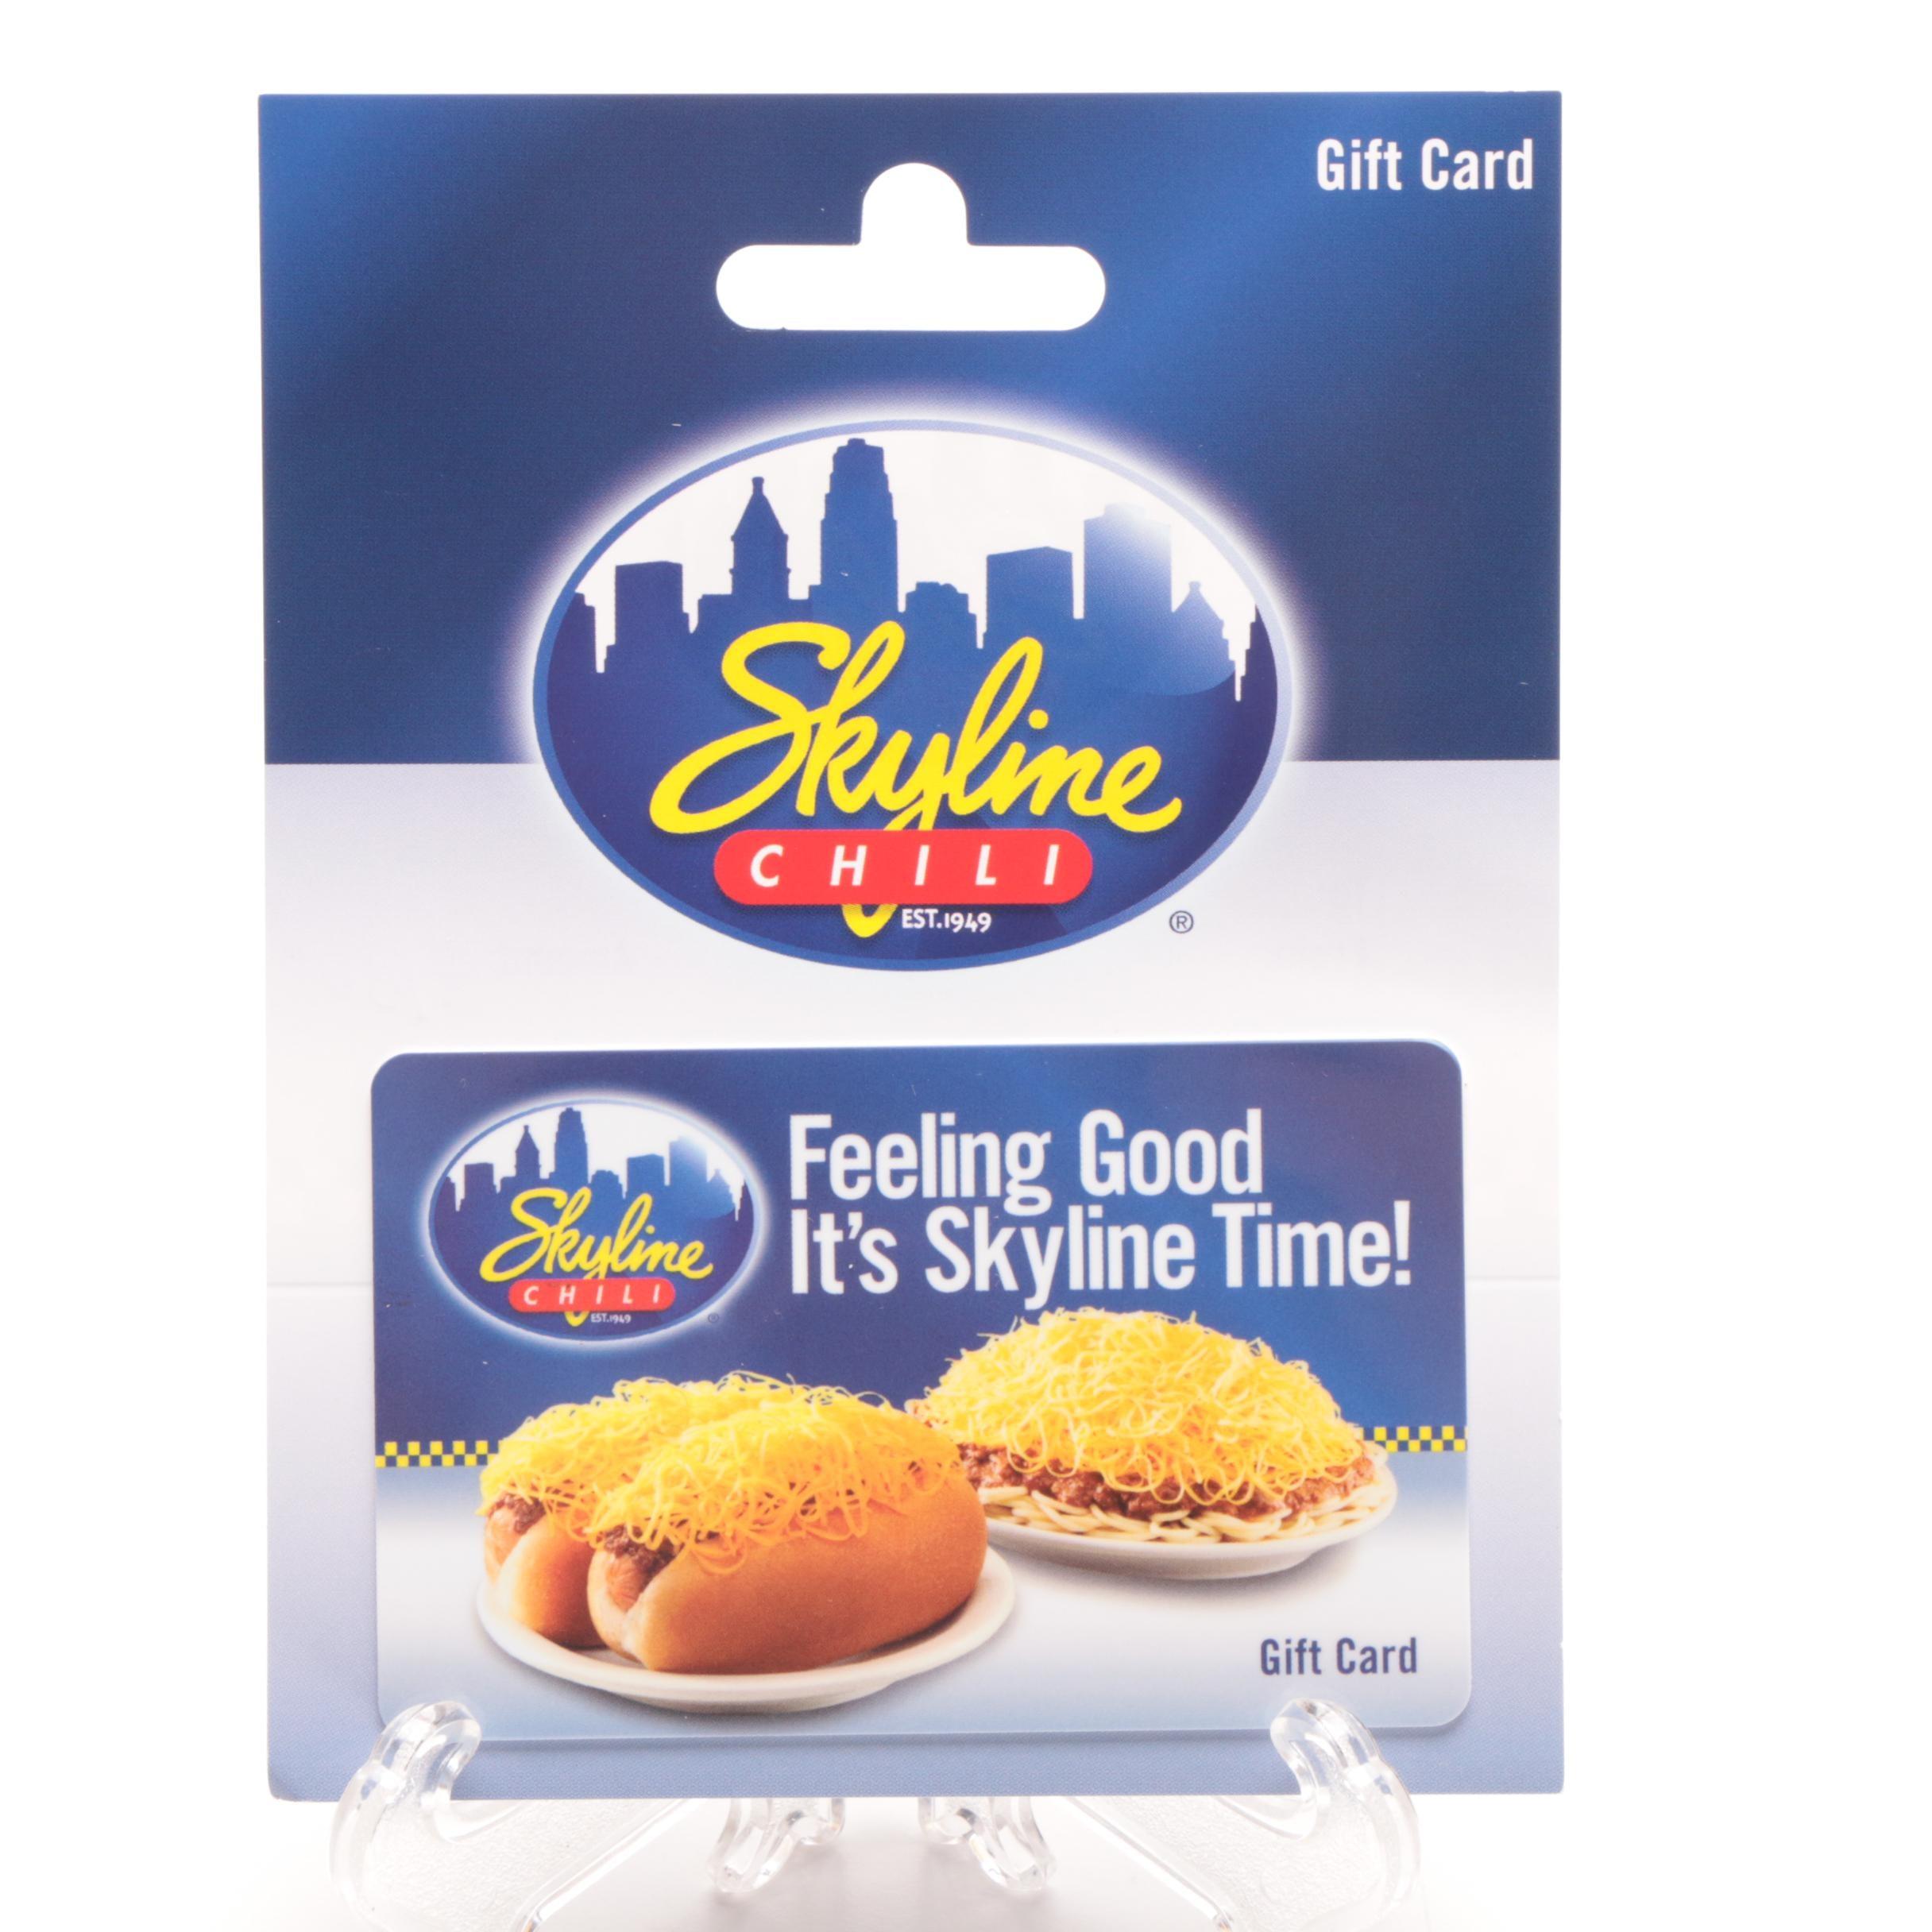 Skyline Chili Restaurants Gift Card